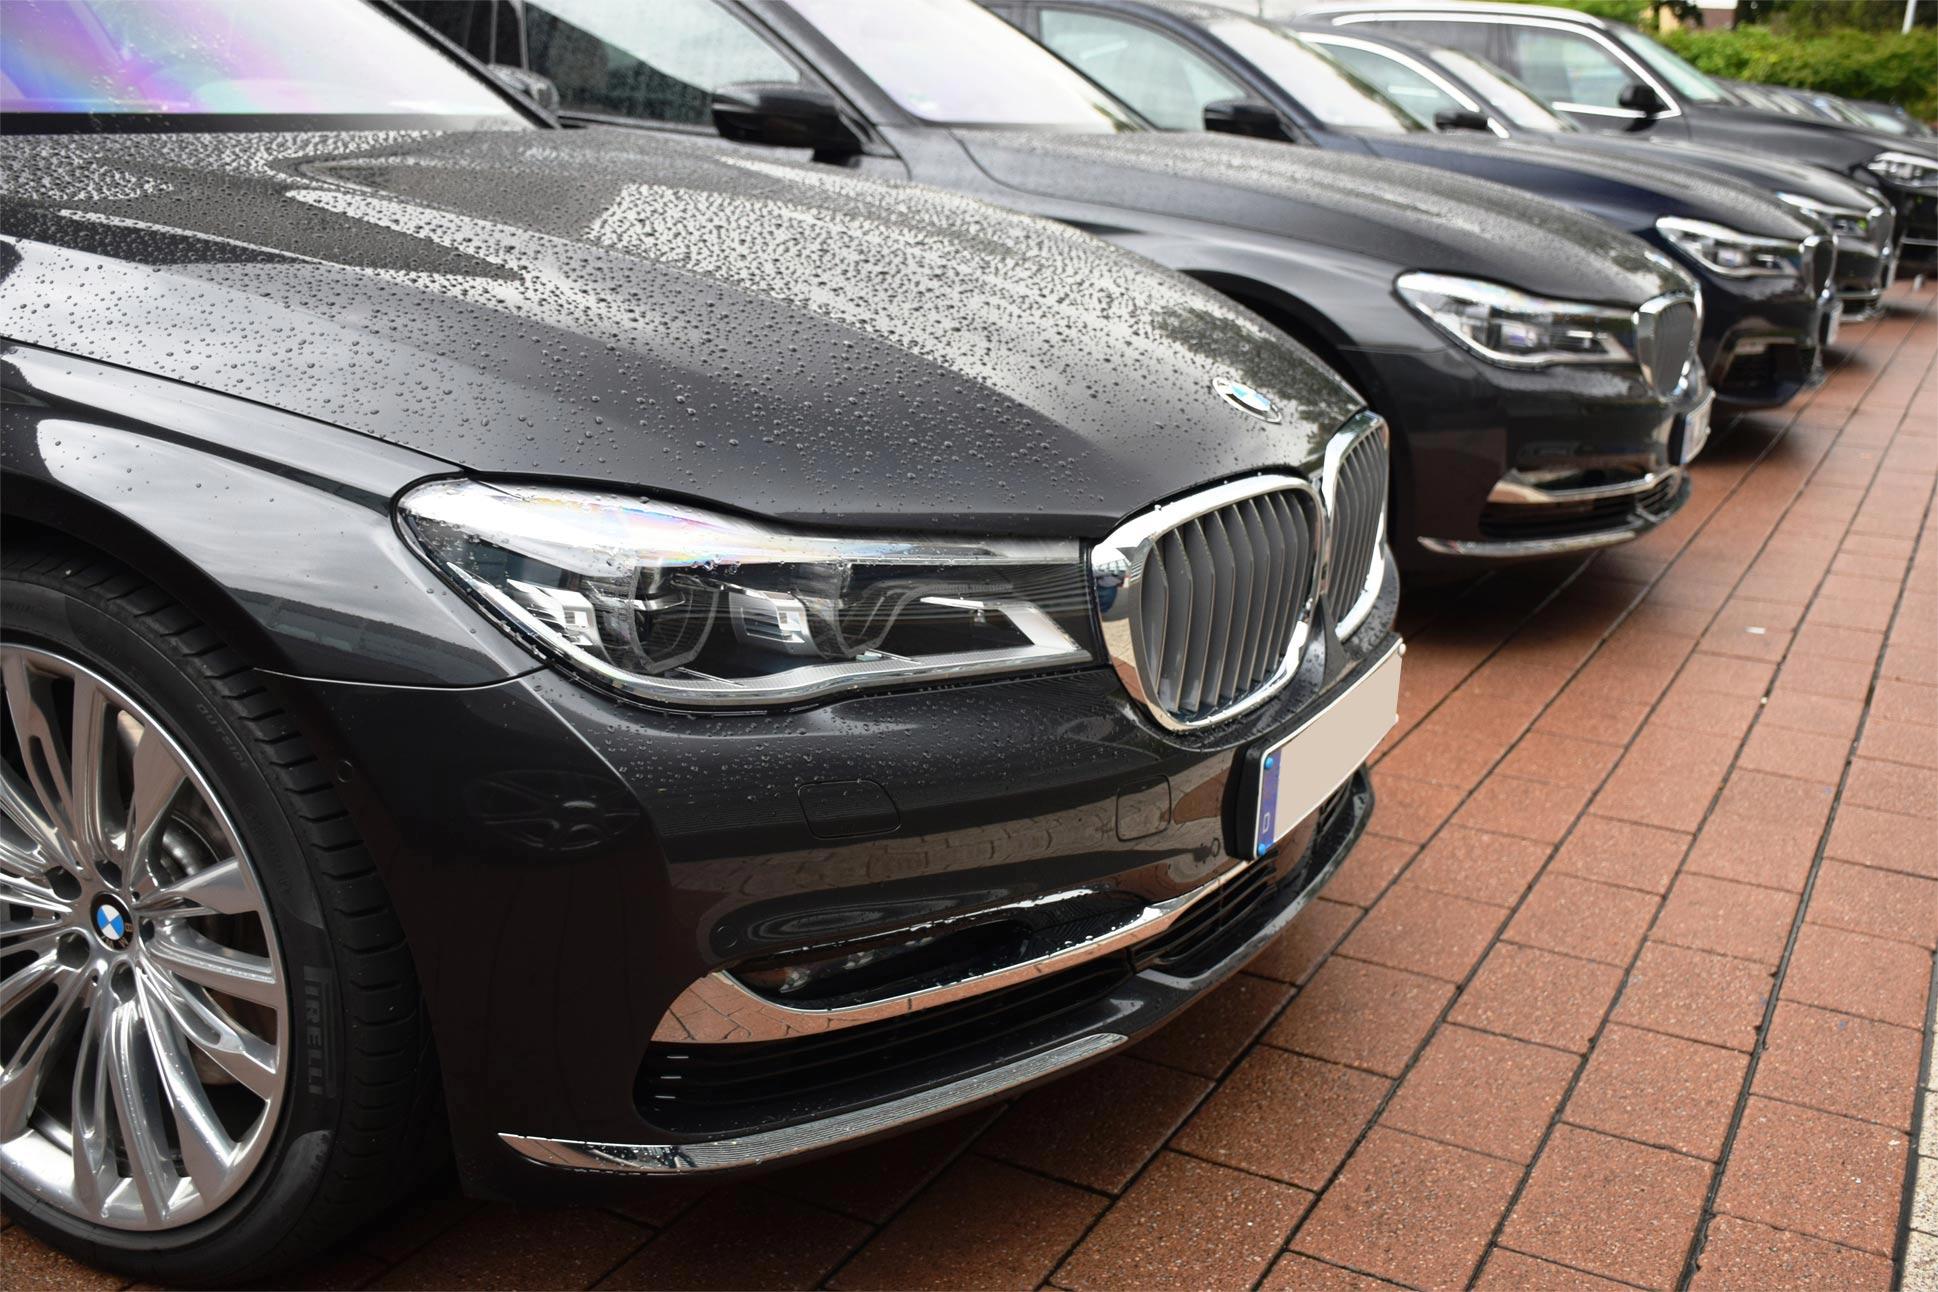 Car Rentals In Ct: Used Car Dealer In Old Saybrook, Westbrook, Essex, Old